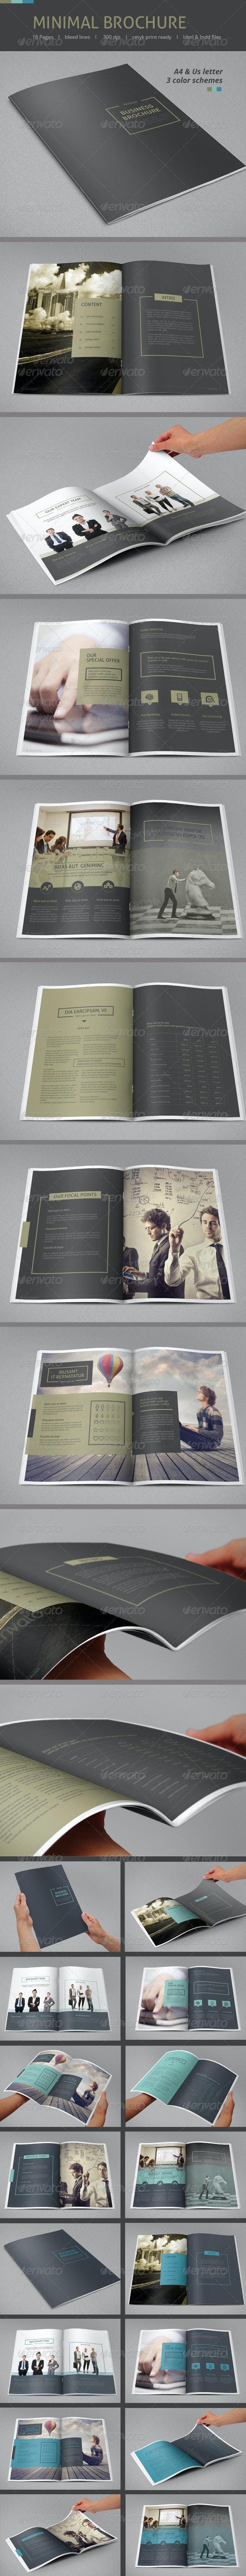 Minimal Business Brochure - Informational Brochures